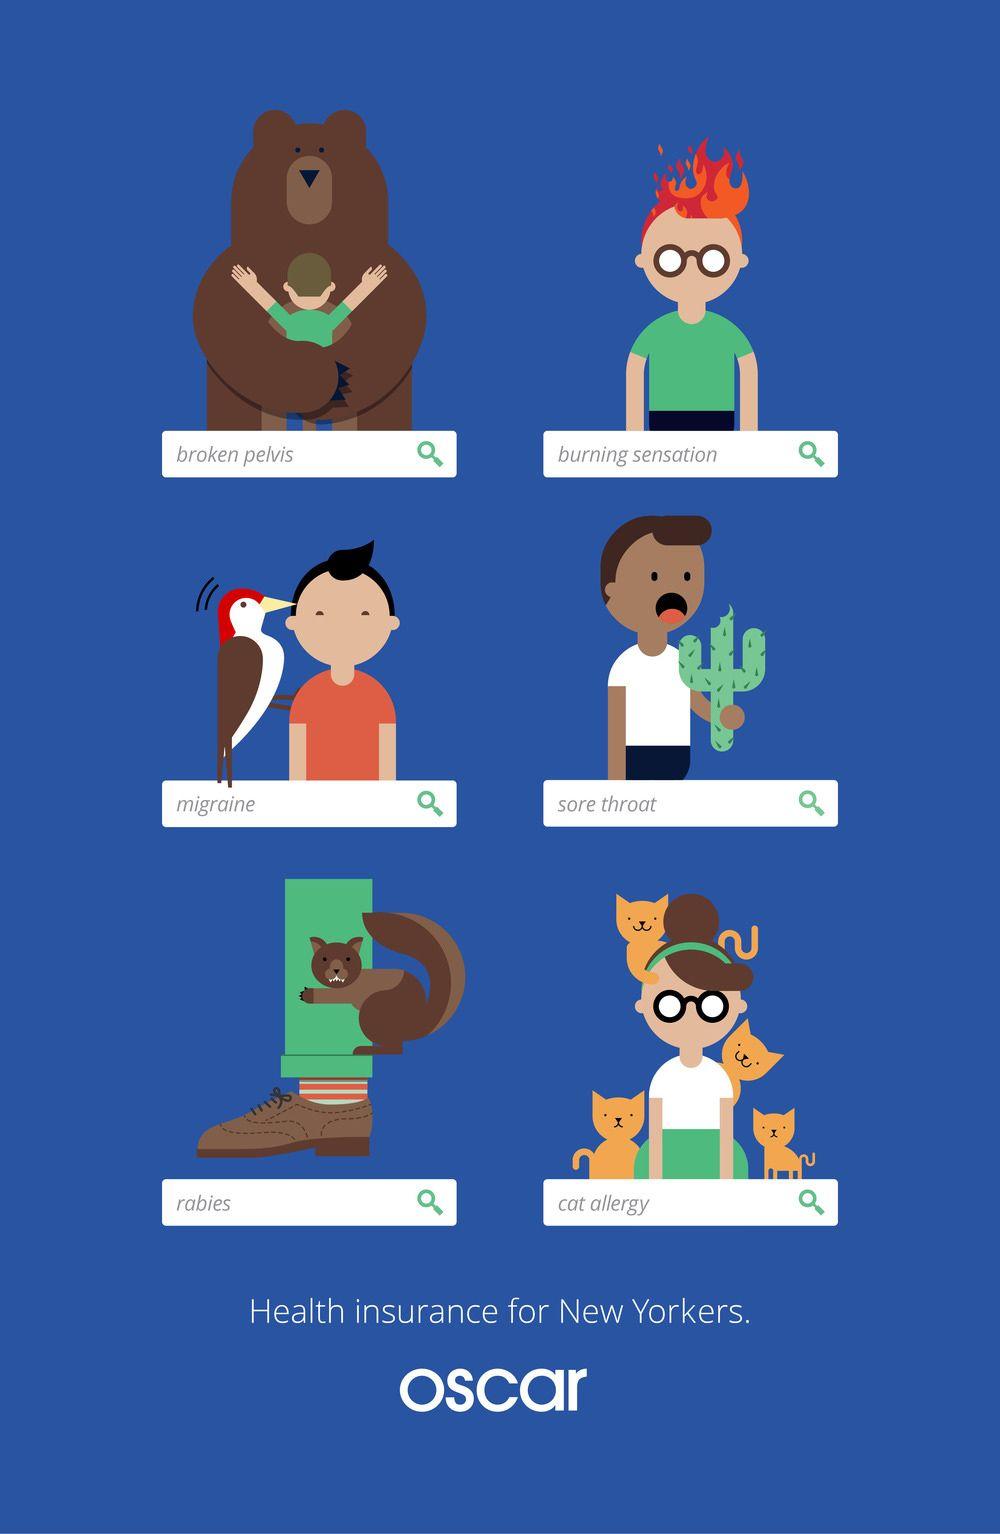 Oscar Is A Health Insurance Startup For Digital Natives